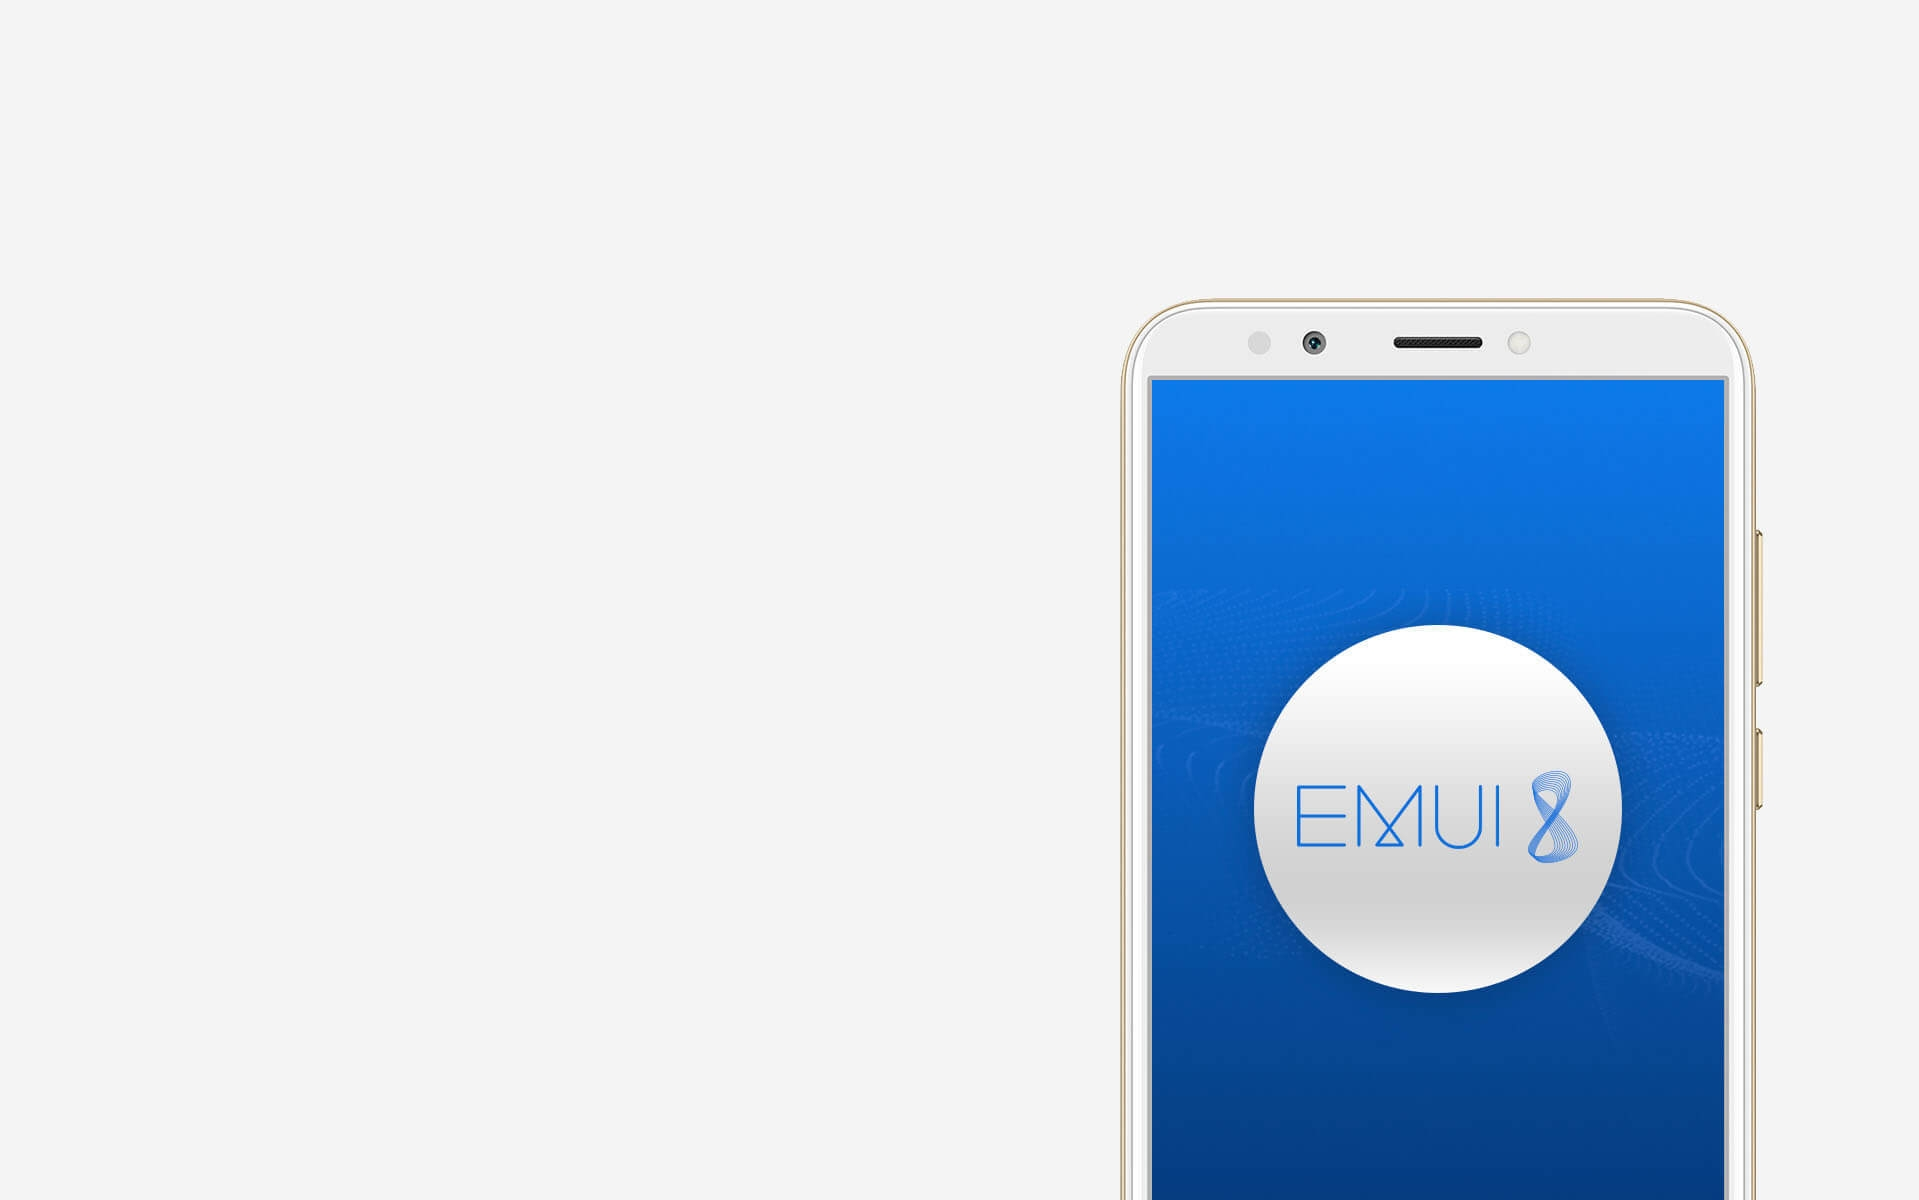 Honor Honor 7C, 3GB + 32GB (Dual SIM), Blue @ Best Price